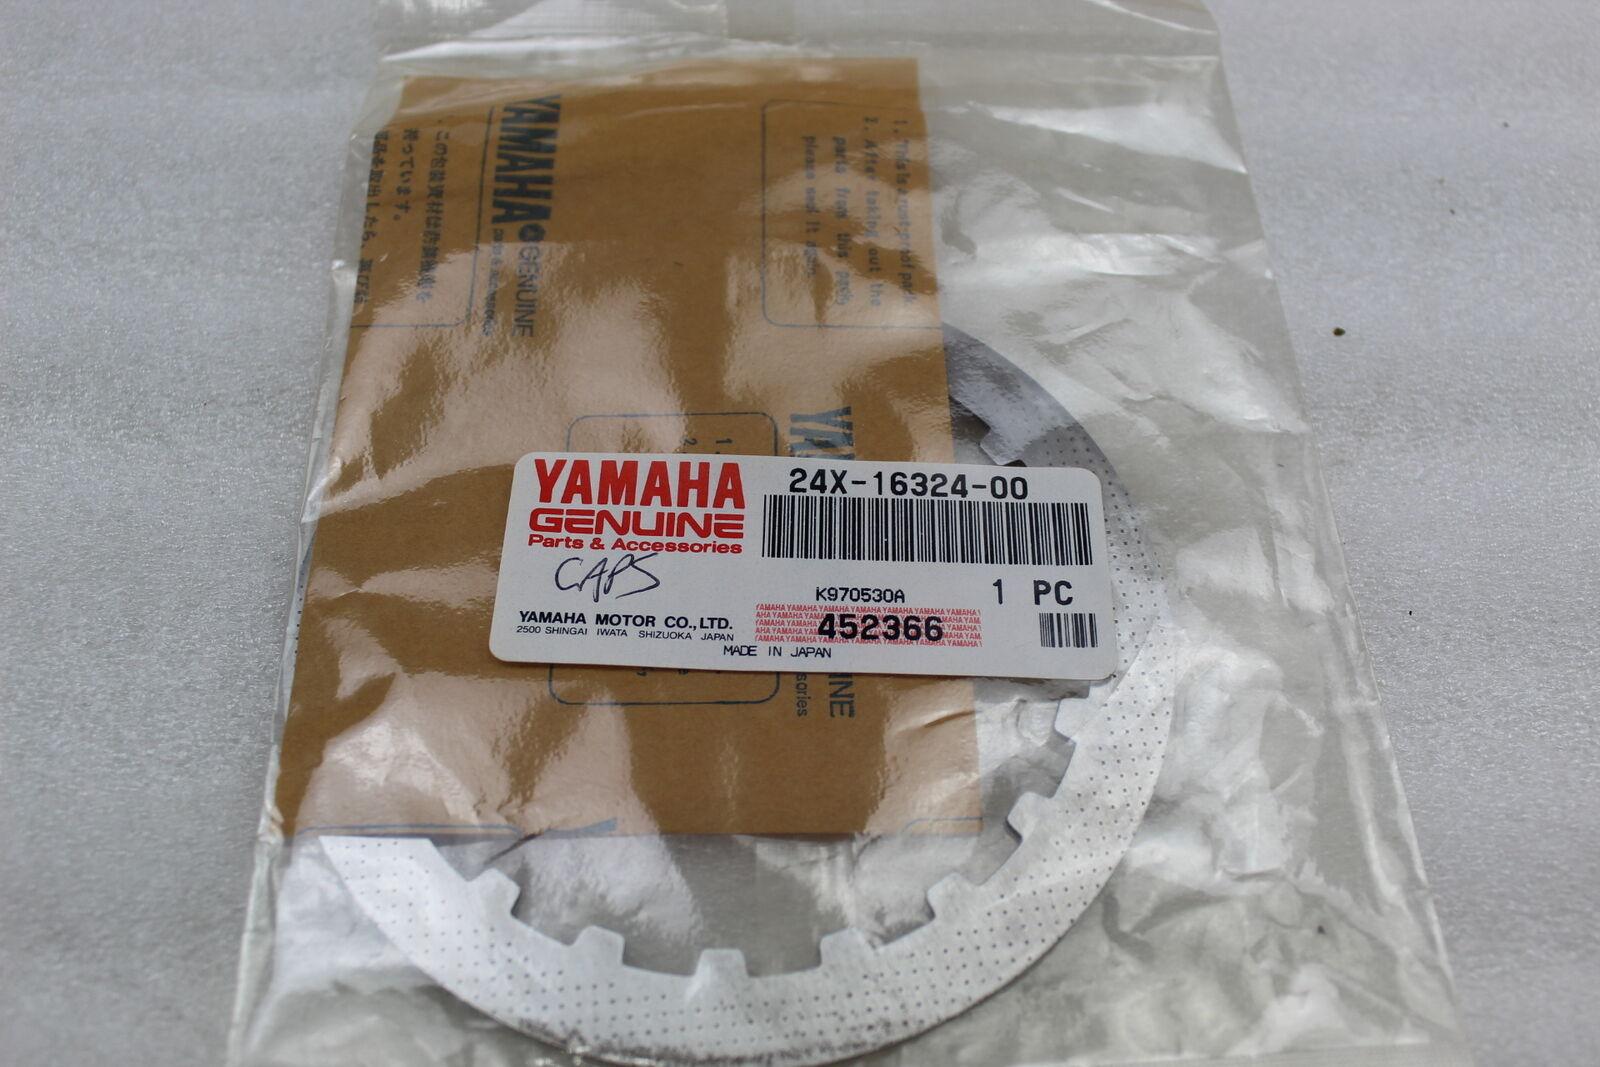 YAMAHA CLUTCH PLATE 24X-16324-00